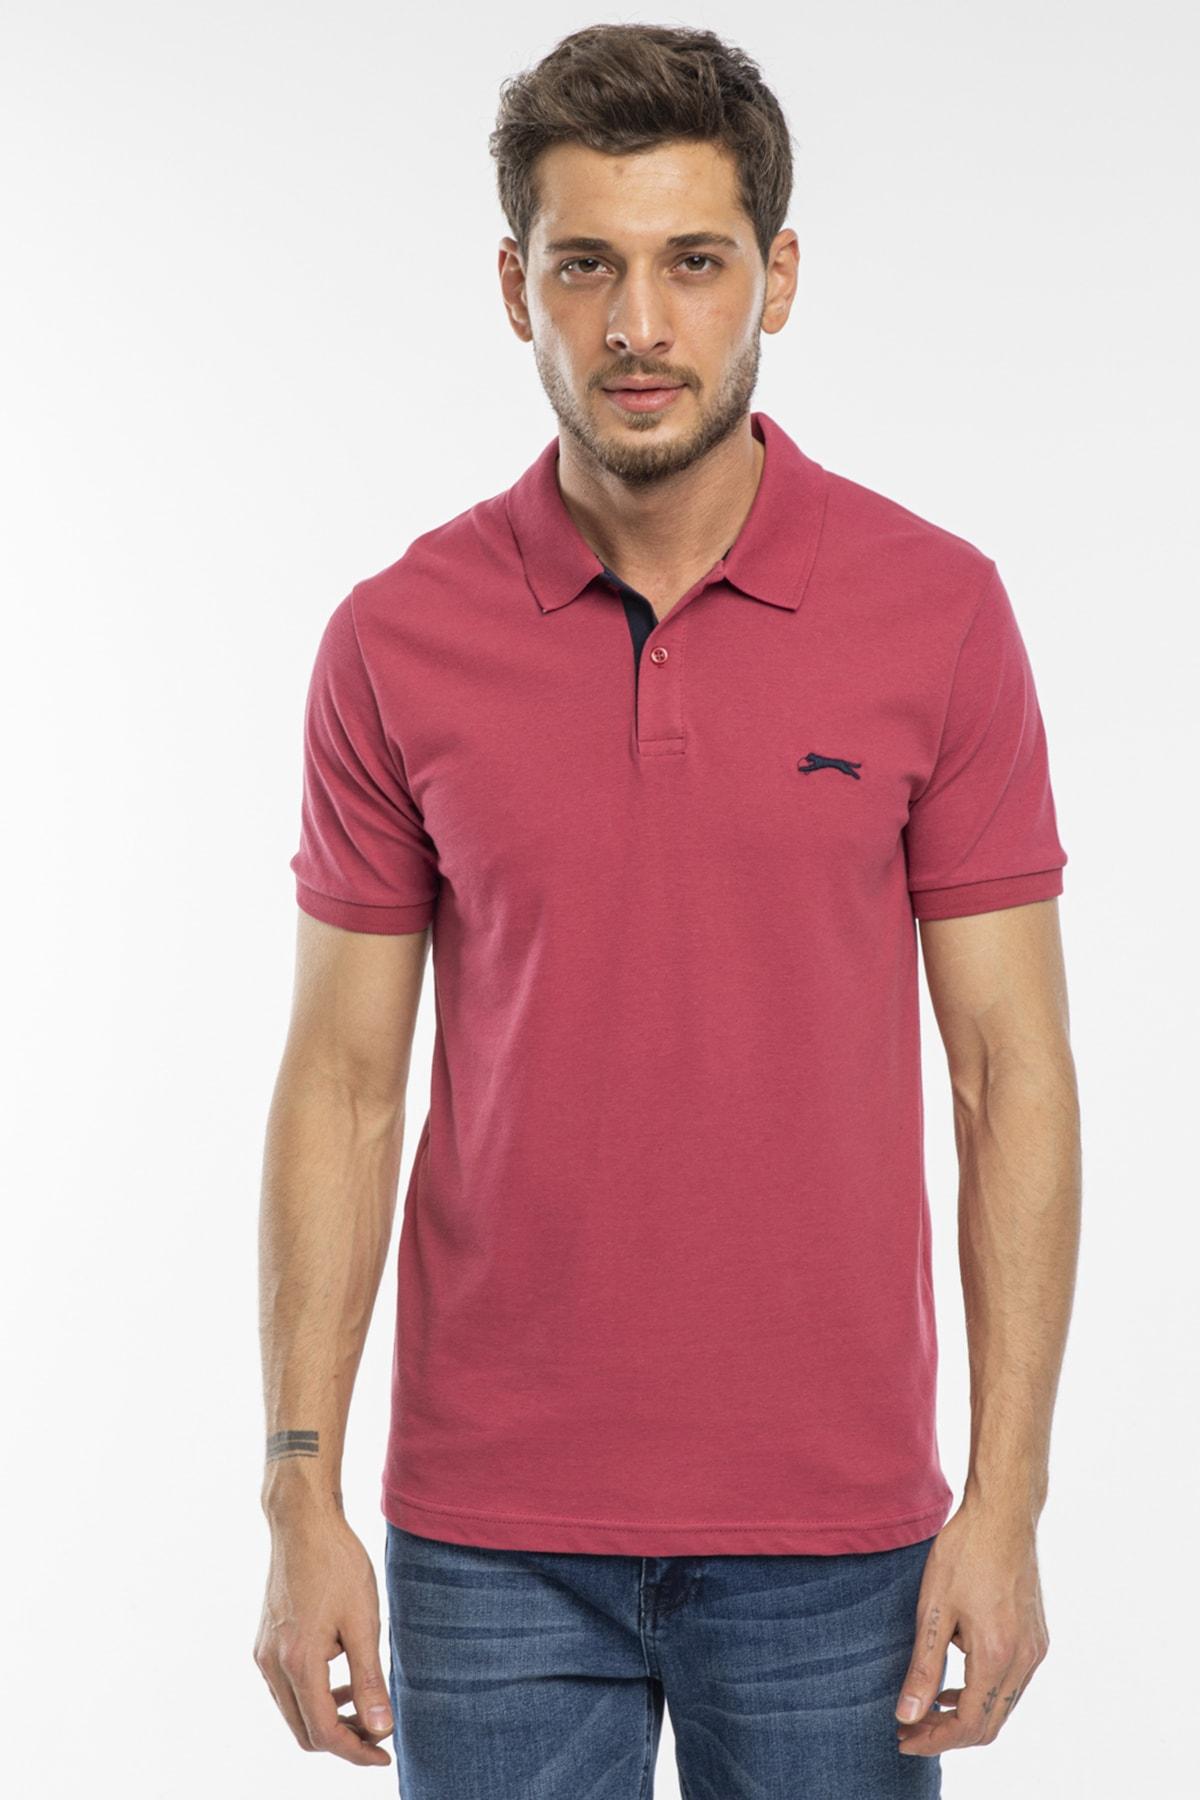 Bambı Erkek T-shirt Mercan St11te100